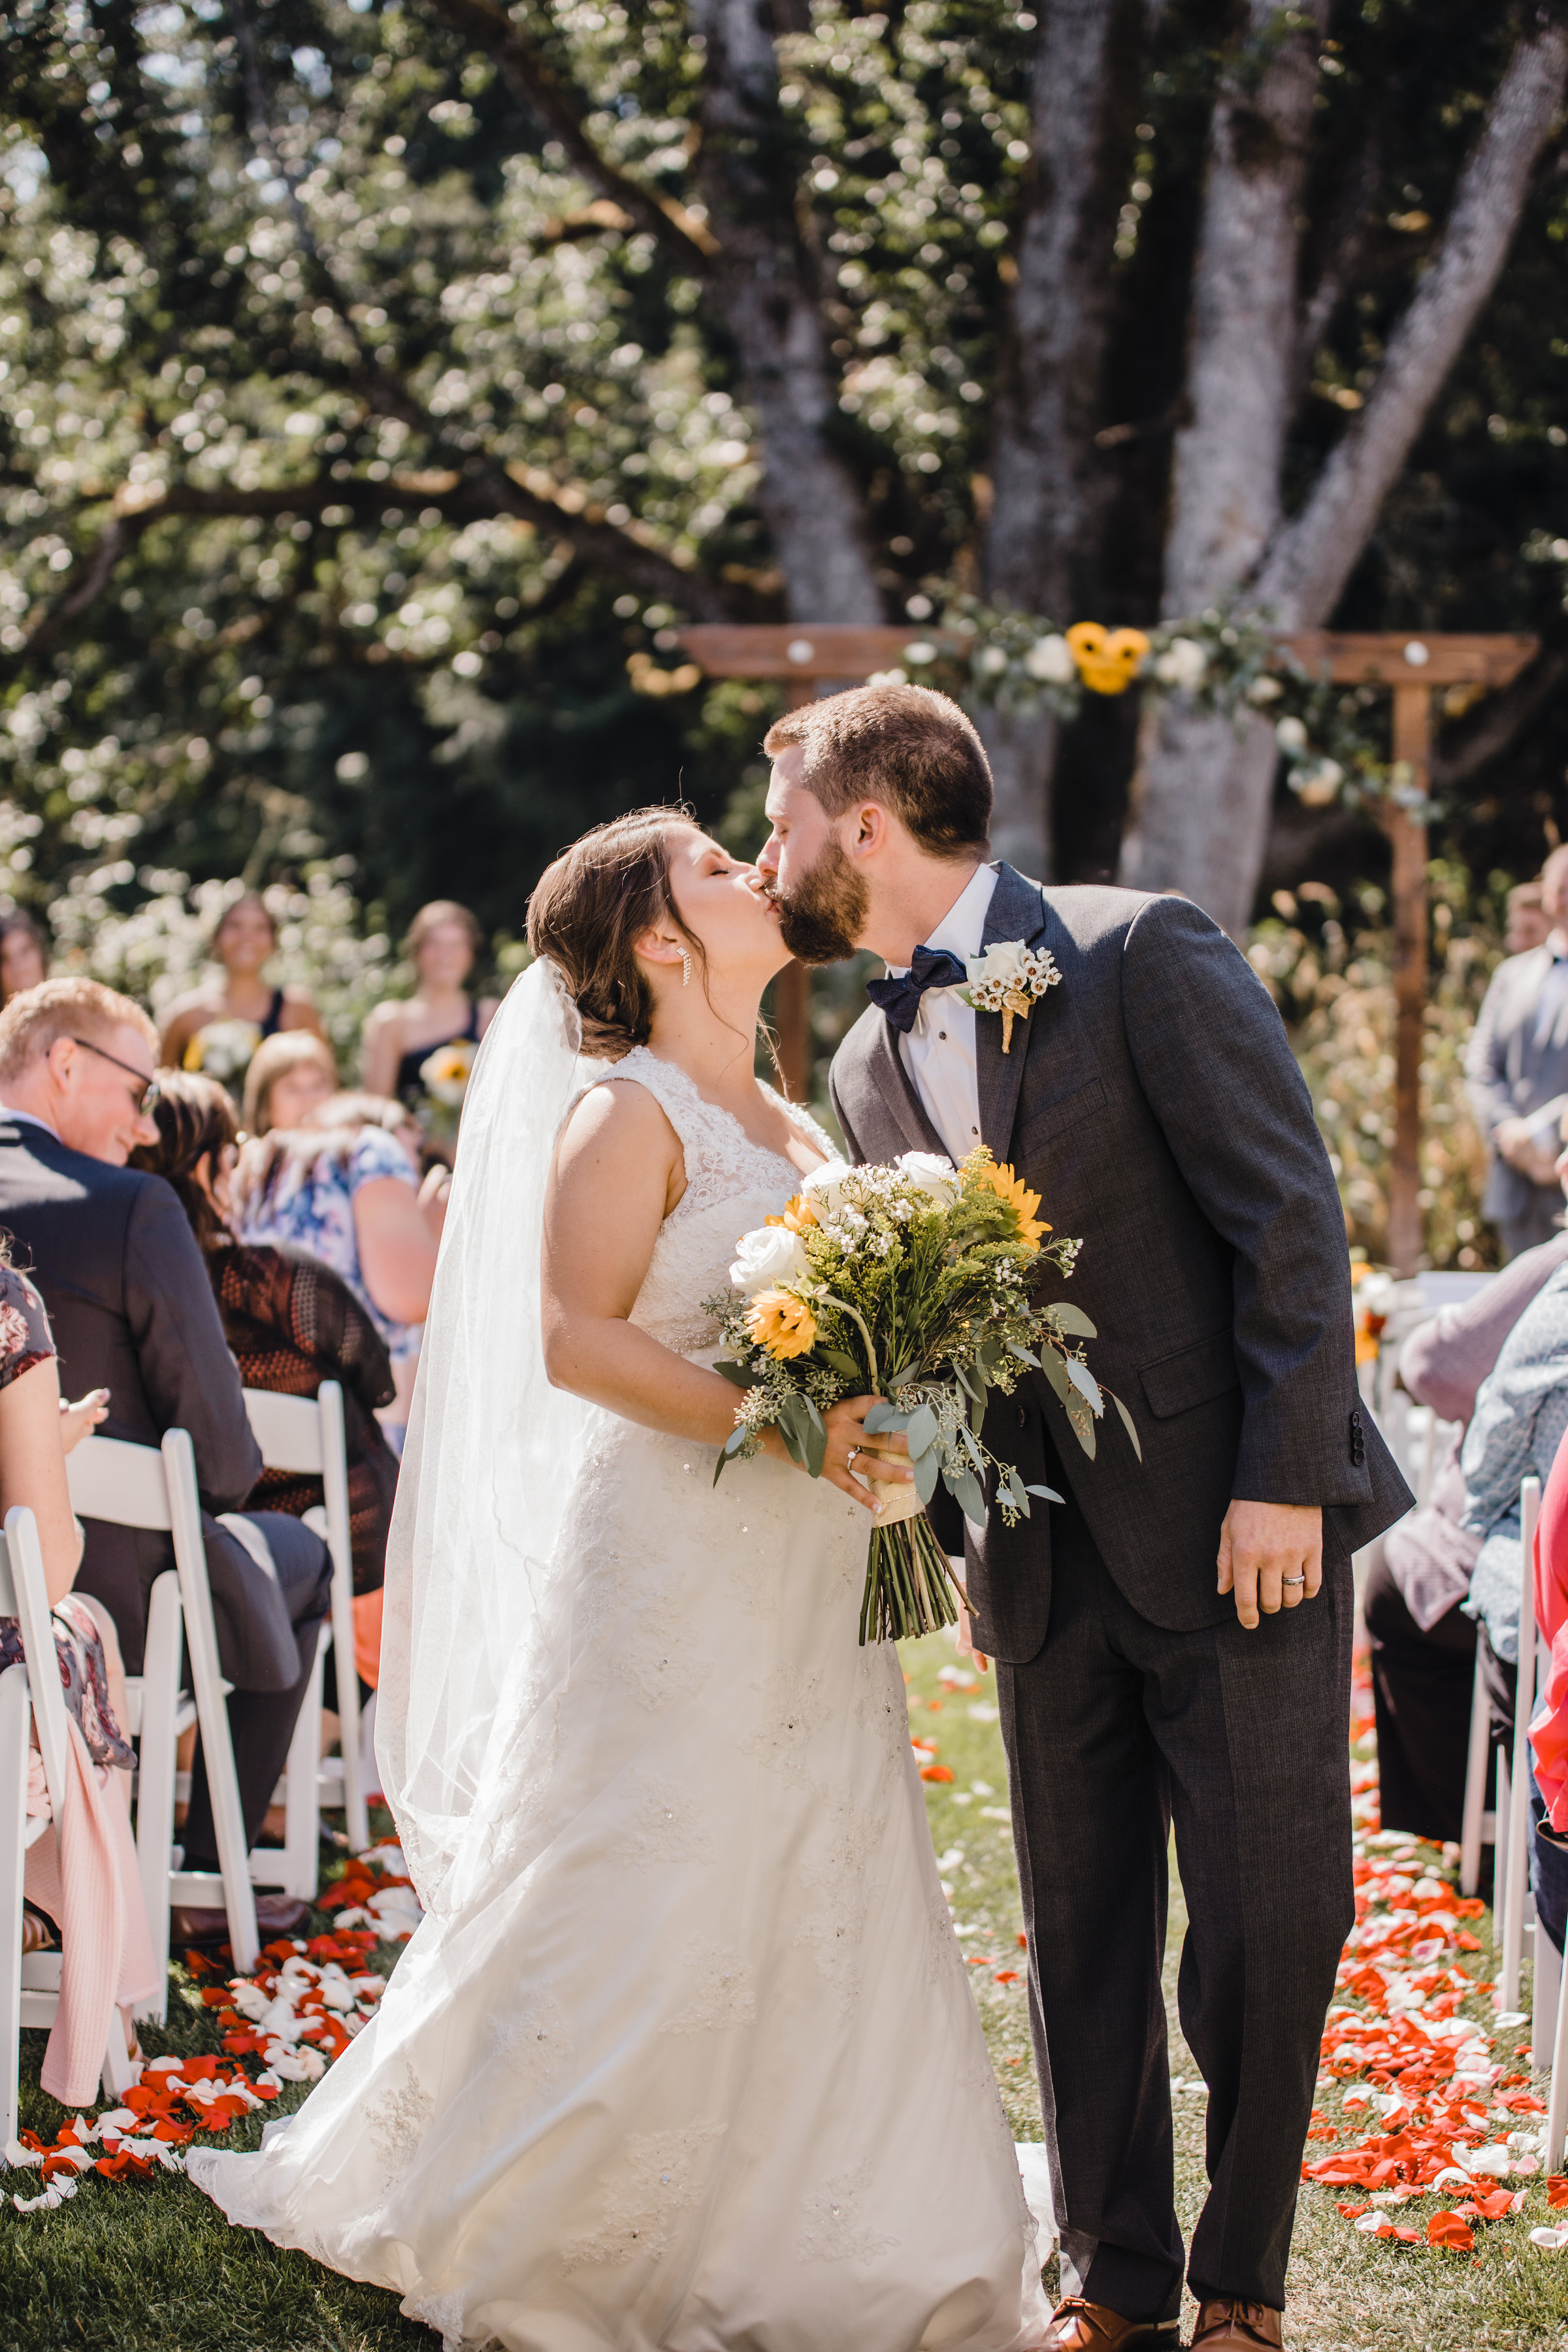 olympia washington professional wedding photographer outdoor wedding ceremony wedding exit kissing cheering happy